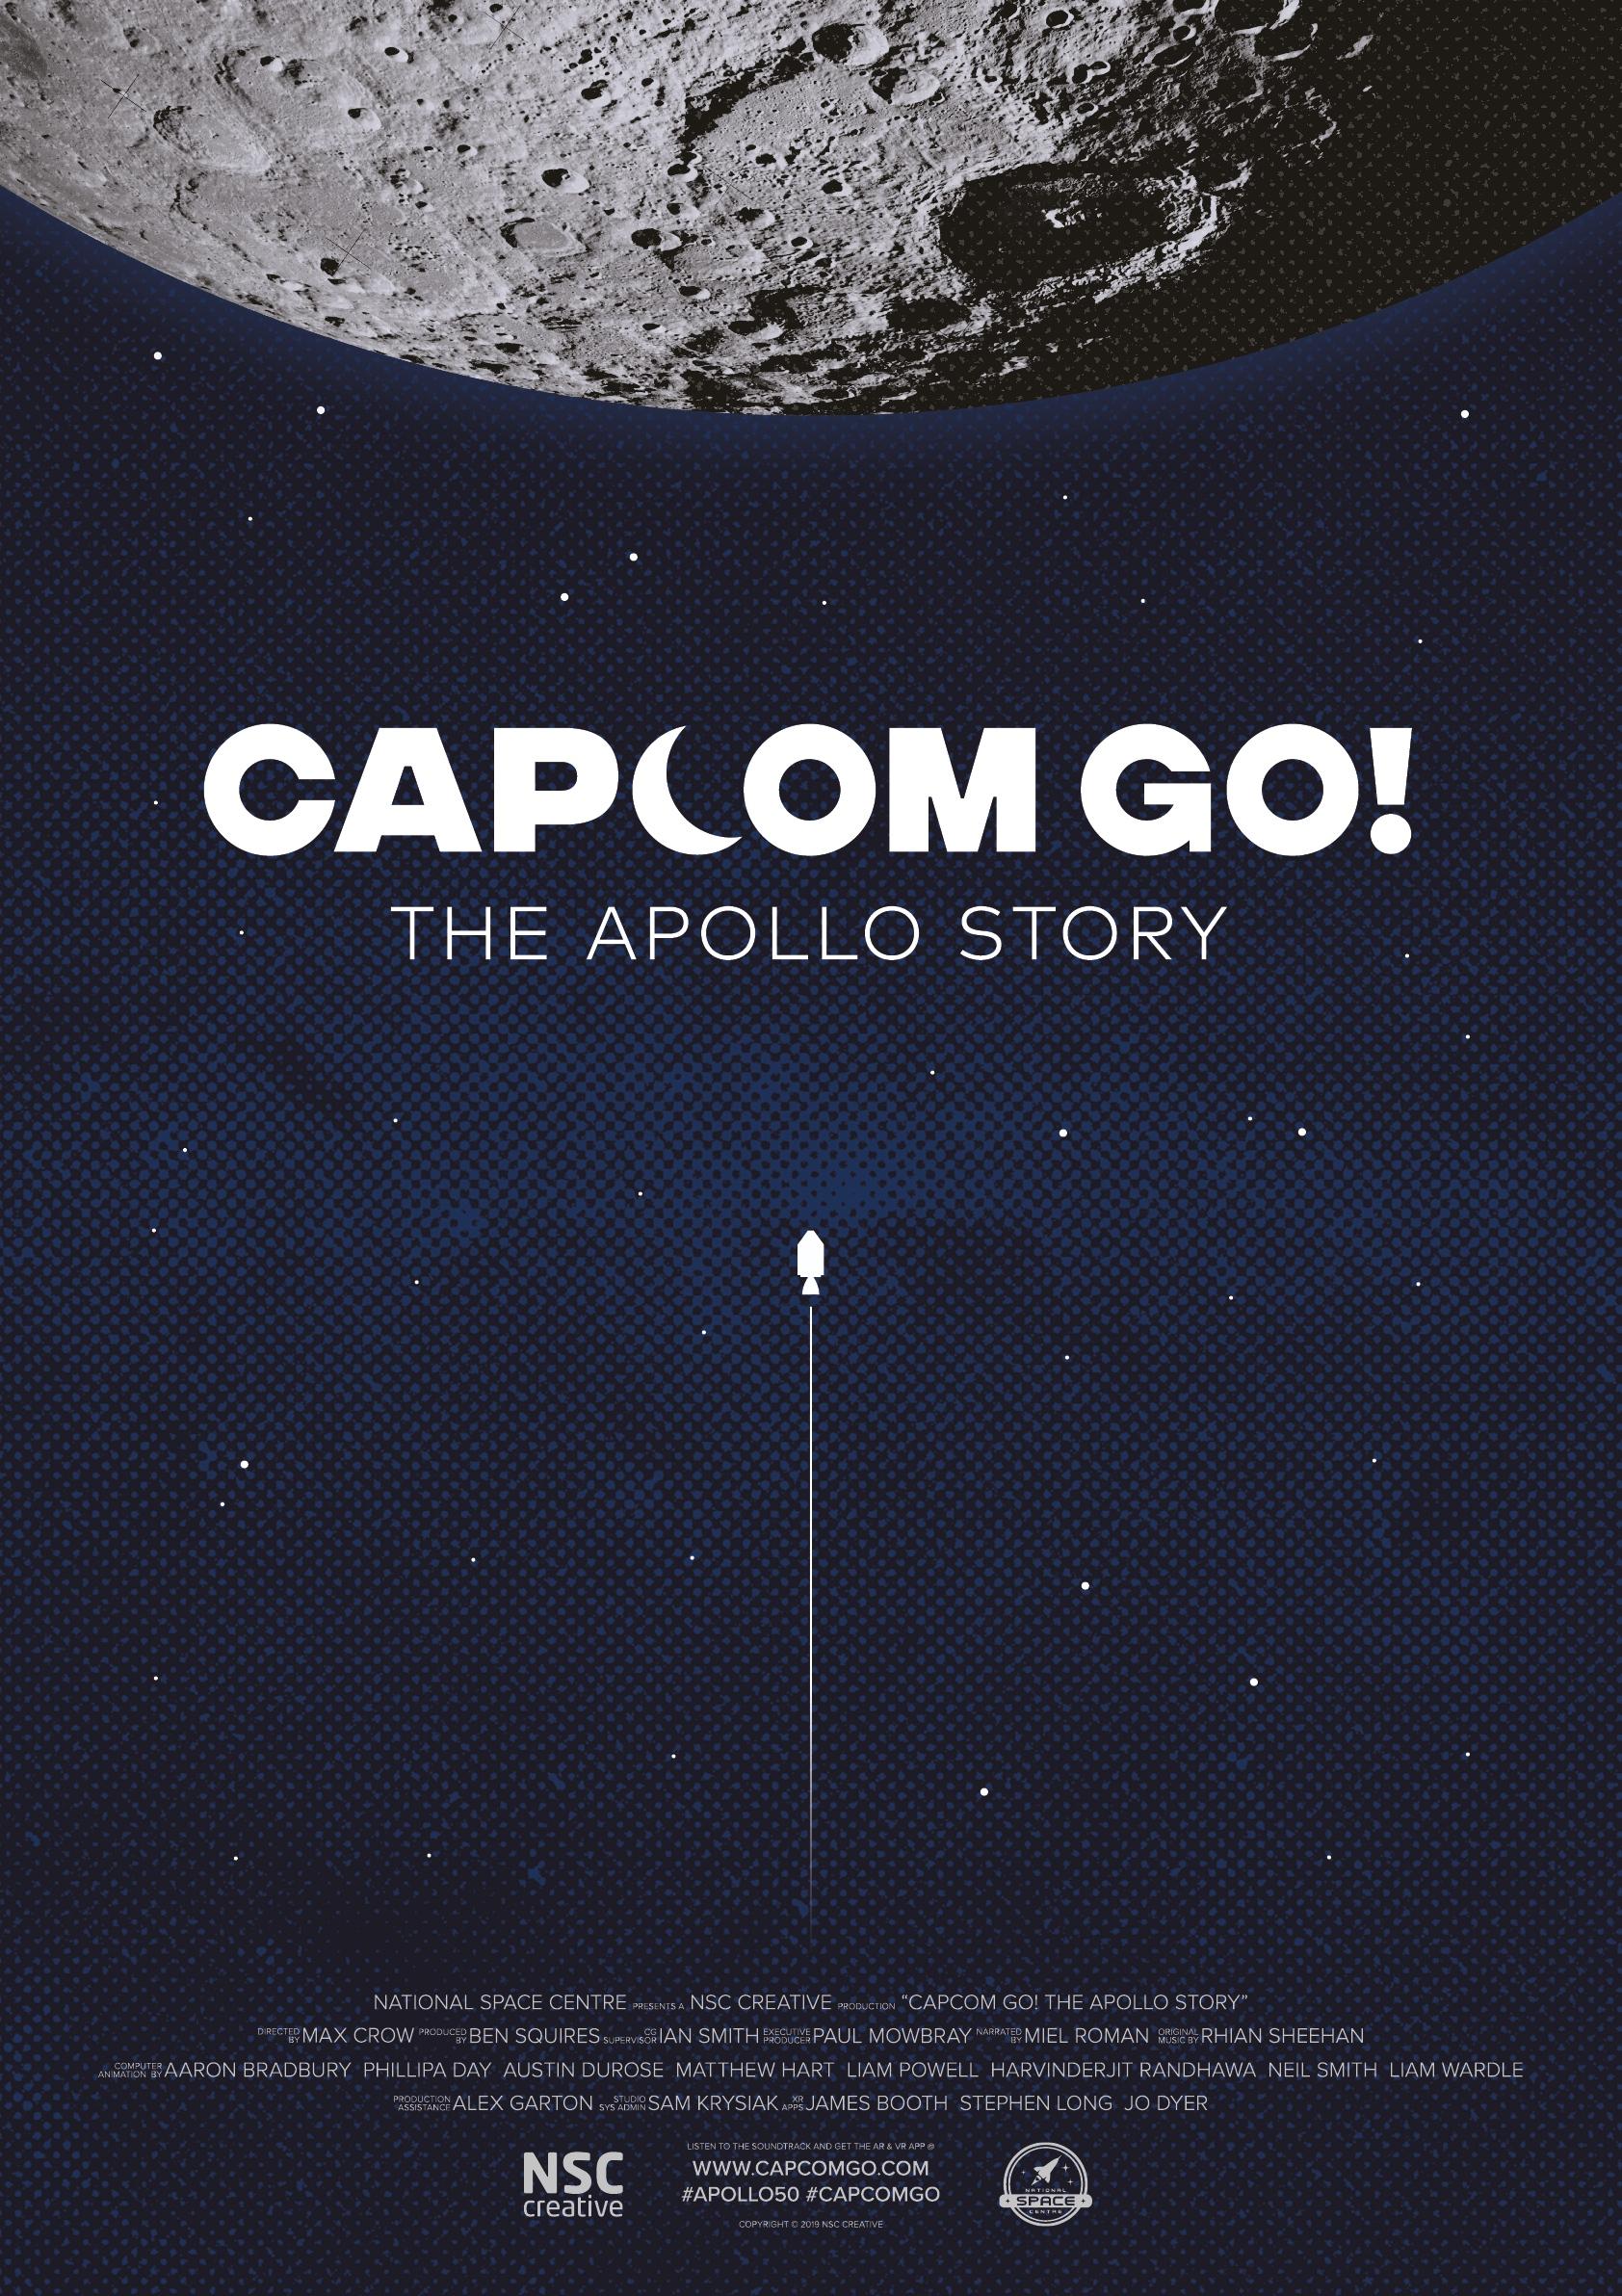 CAPCOM GO! The Apollo Story (2019) - IMDb